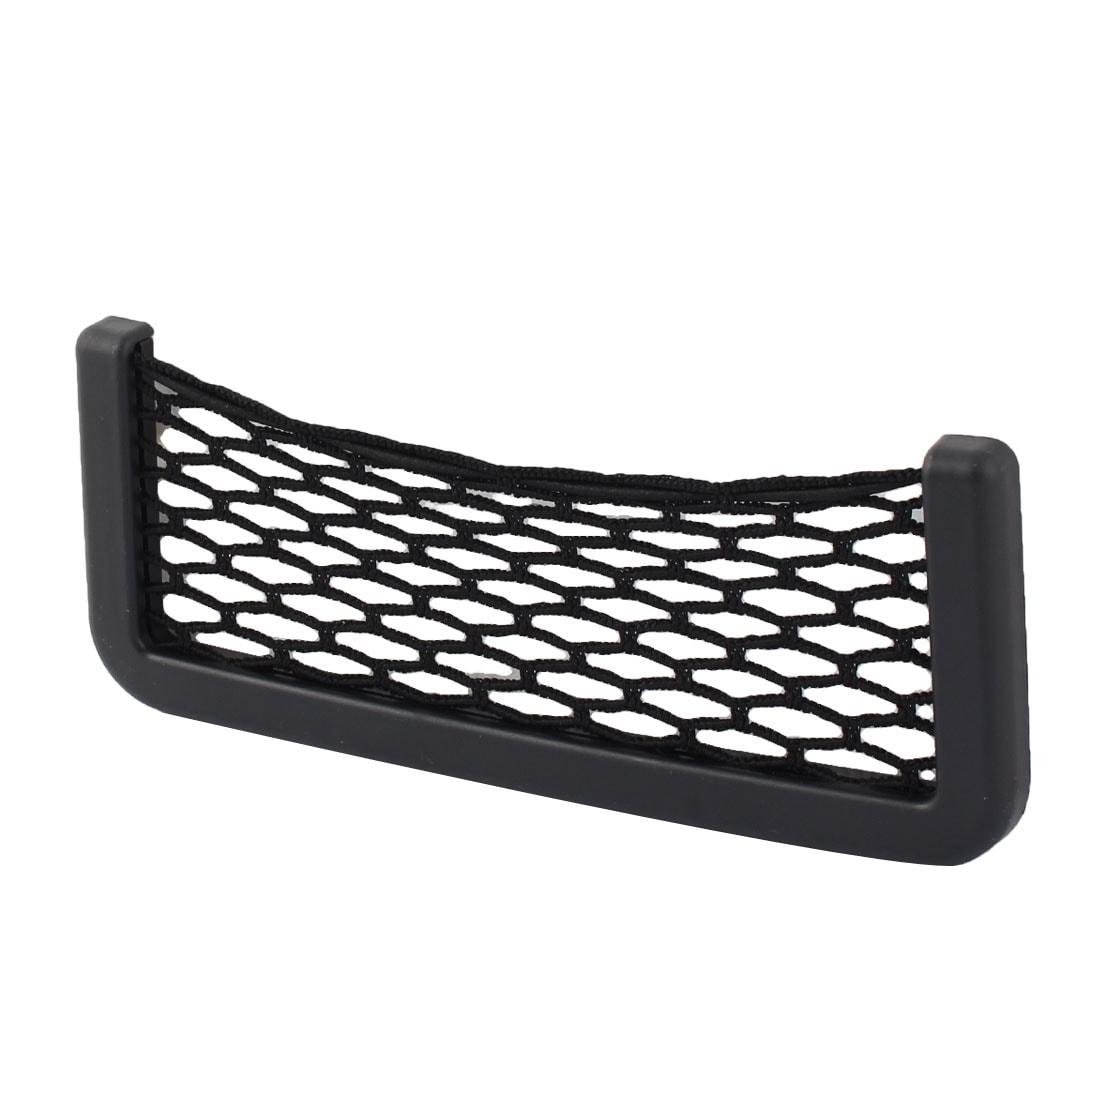 Car Vehicle Plastic Frame Nylon Self-adhesive String Storage Bag Container Black